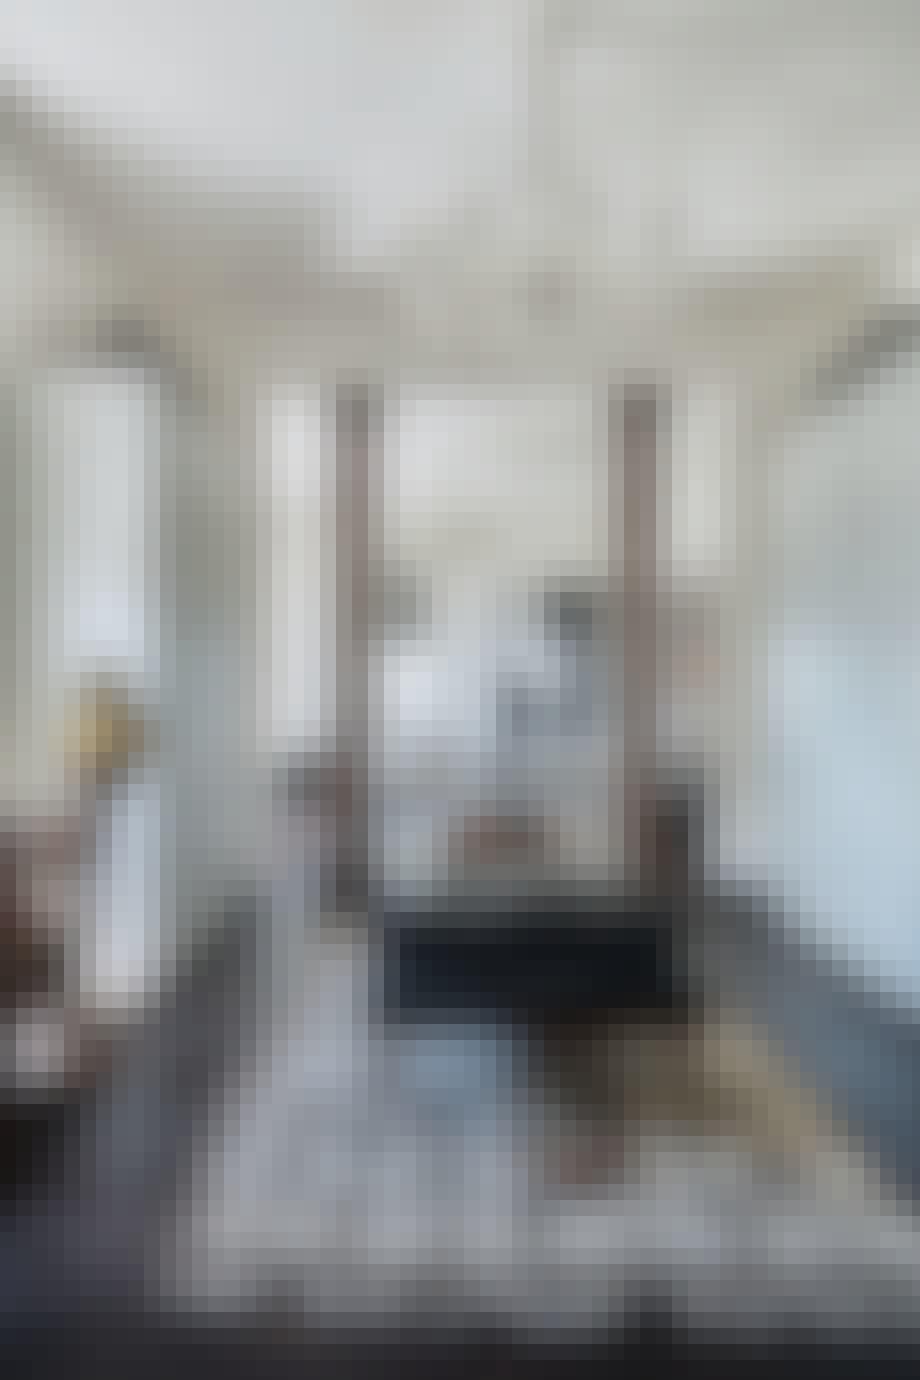 tæppe lysekrone stue indretning malene birger